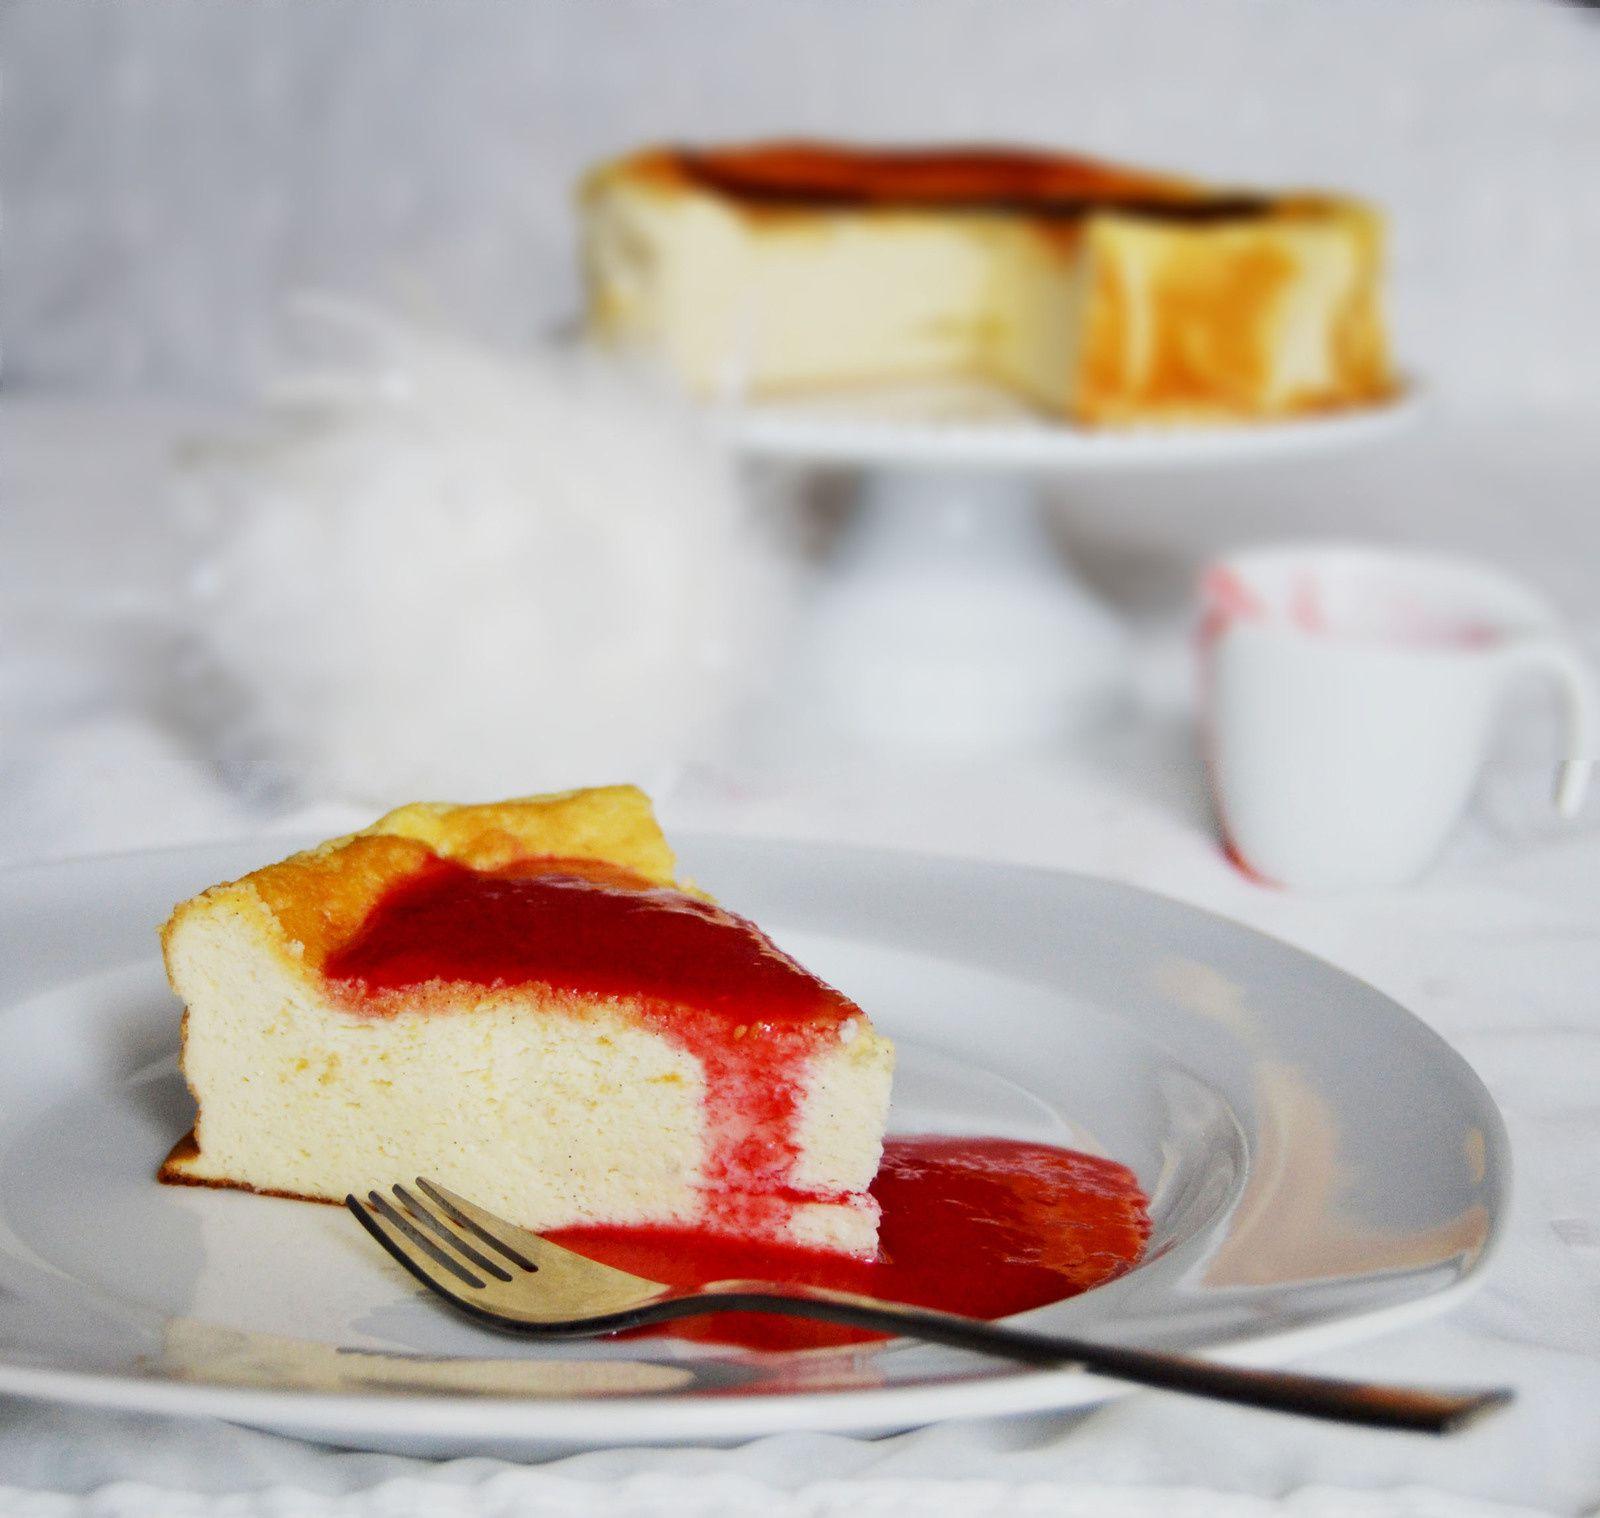 Gâteau Nuage au fromage blanc &amp&#x3B; vanille